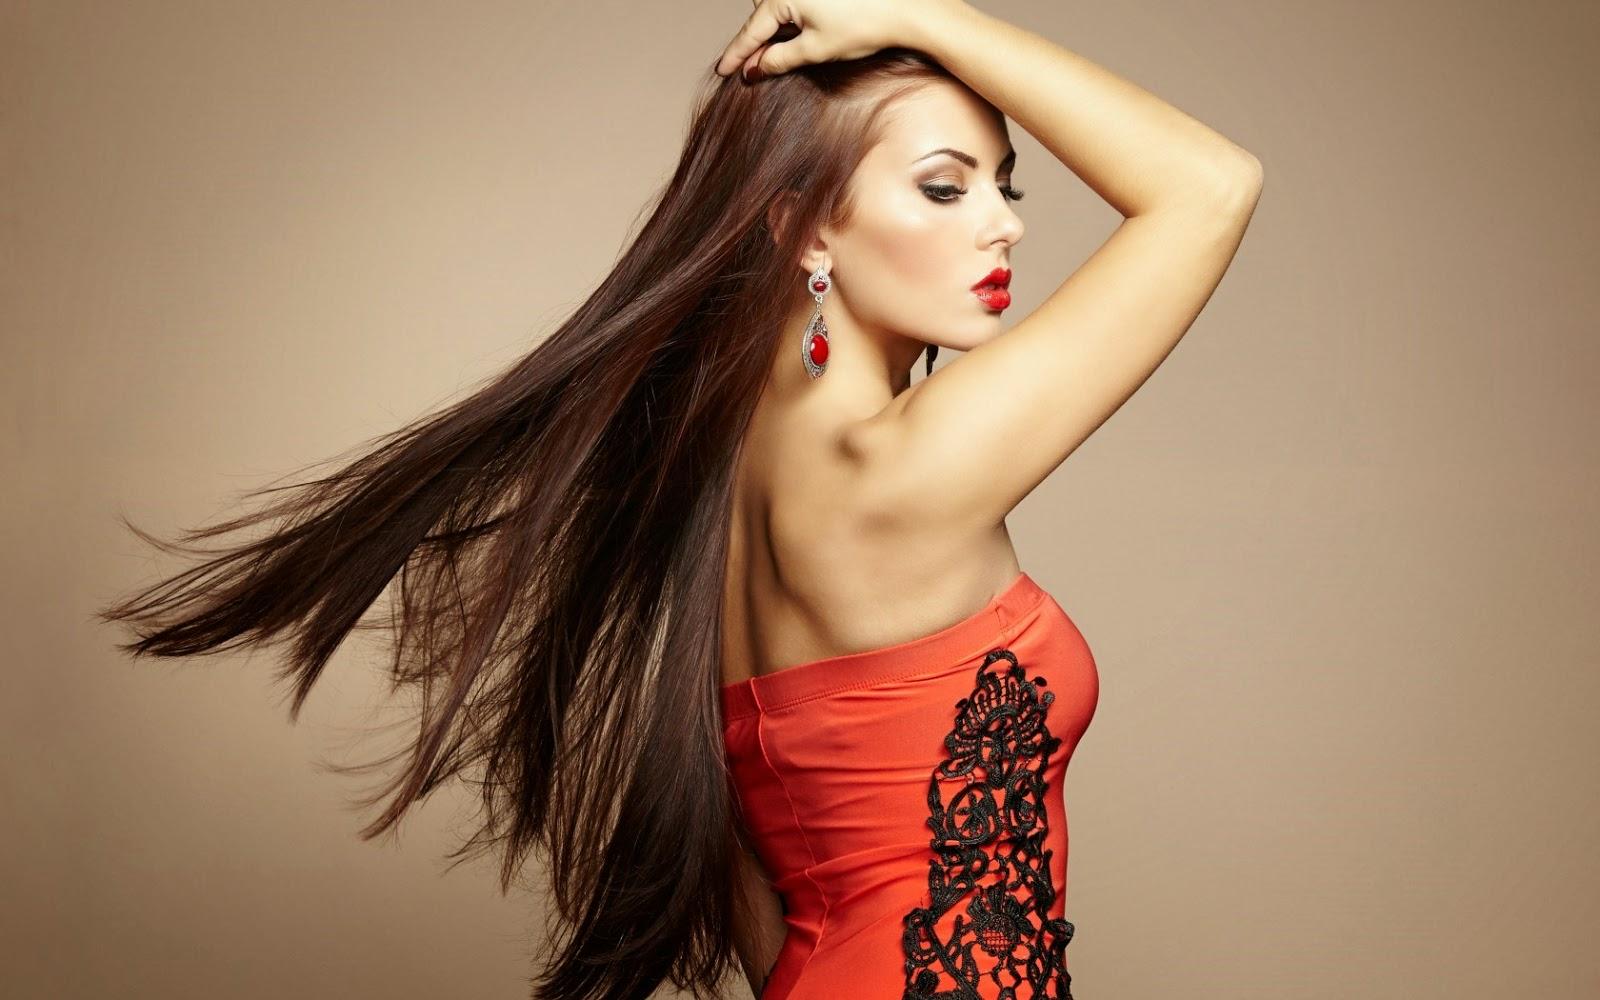 hd wallpapers women models - photo #22